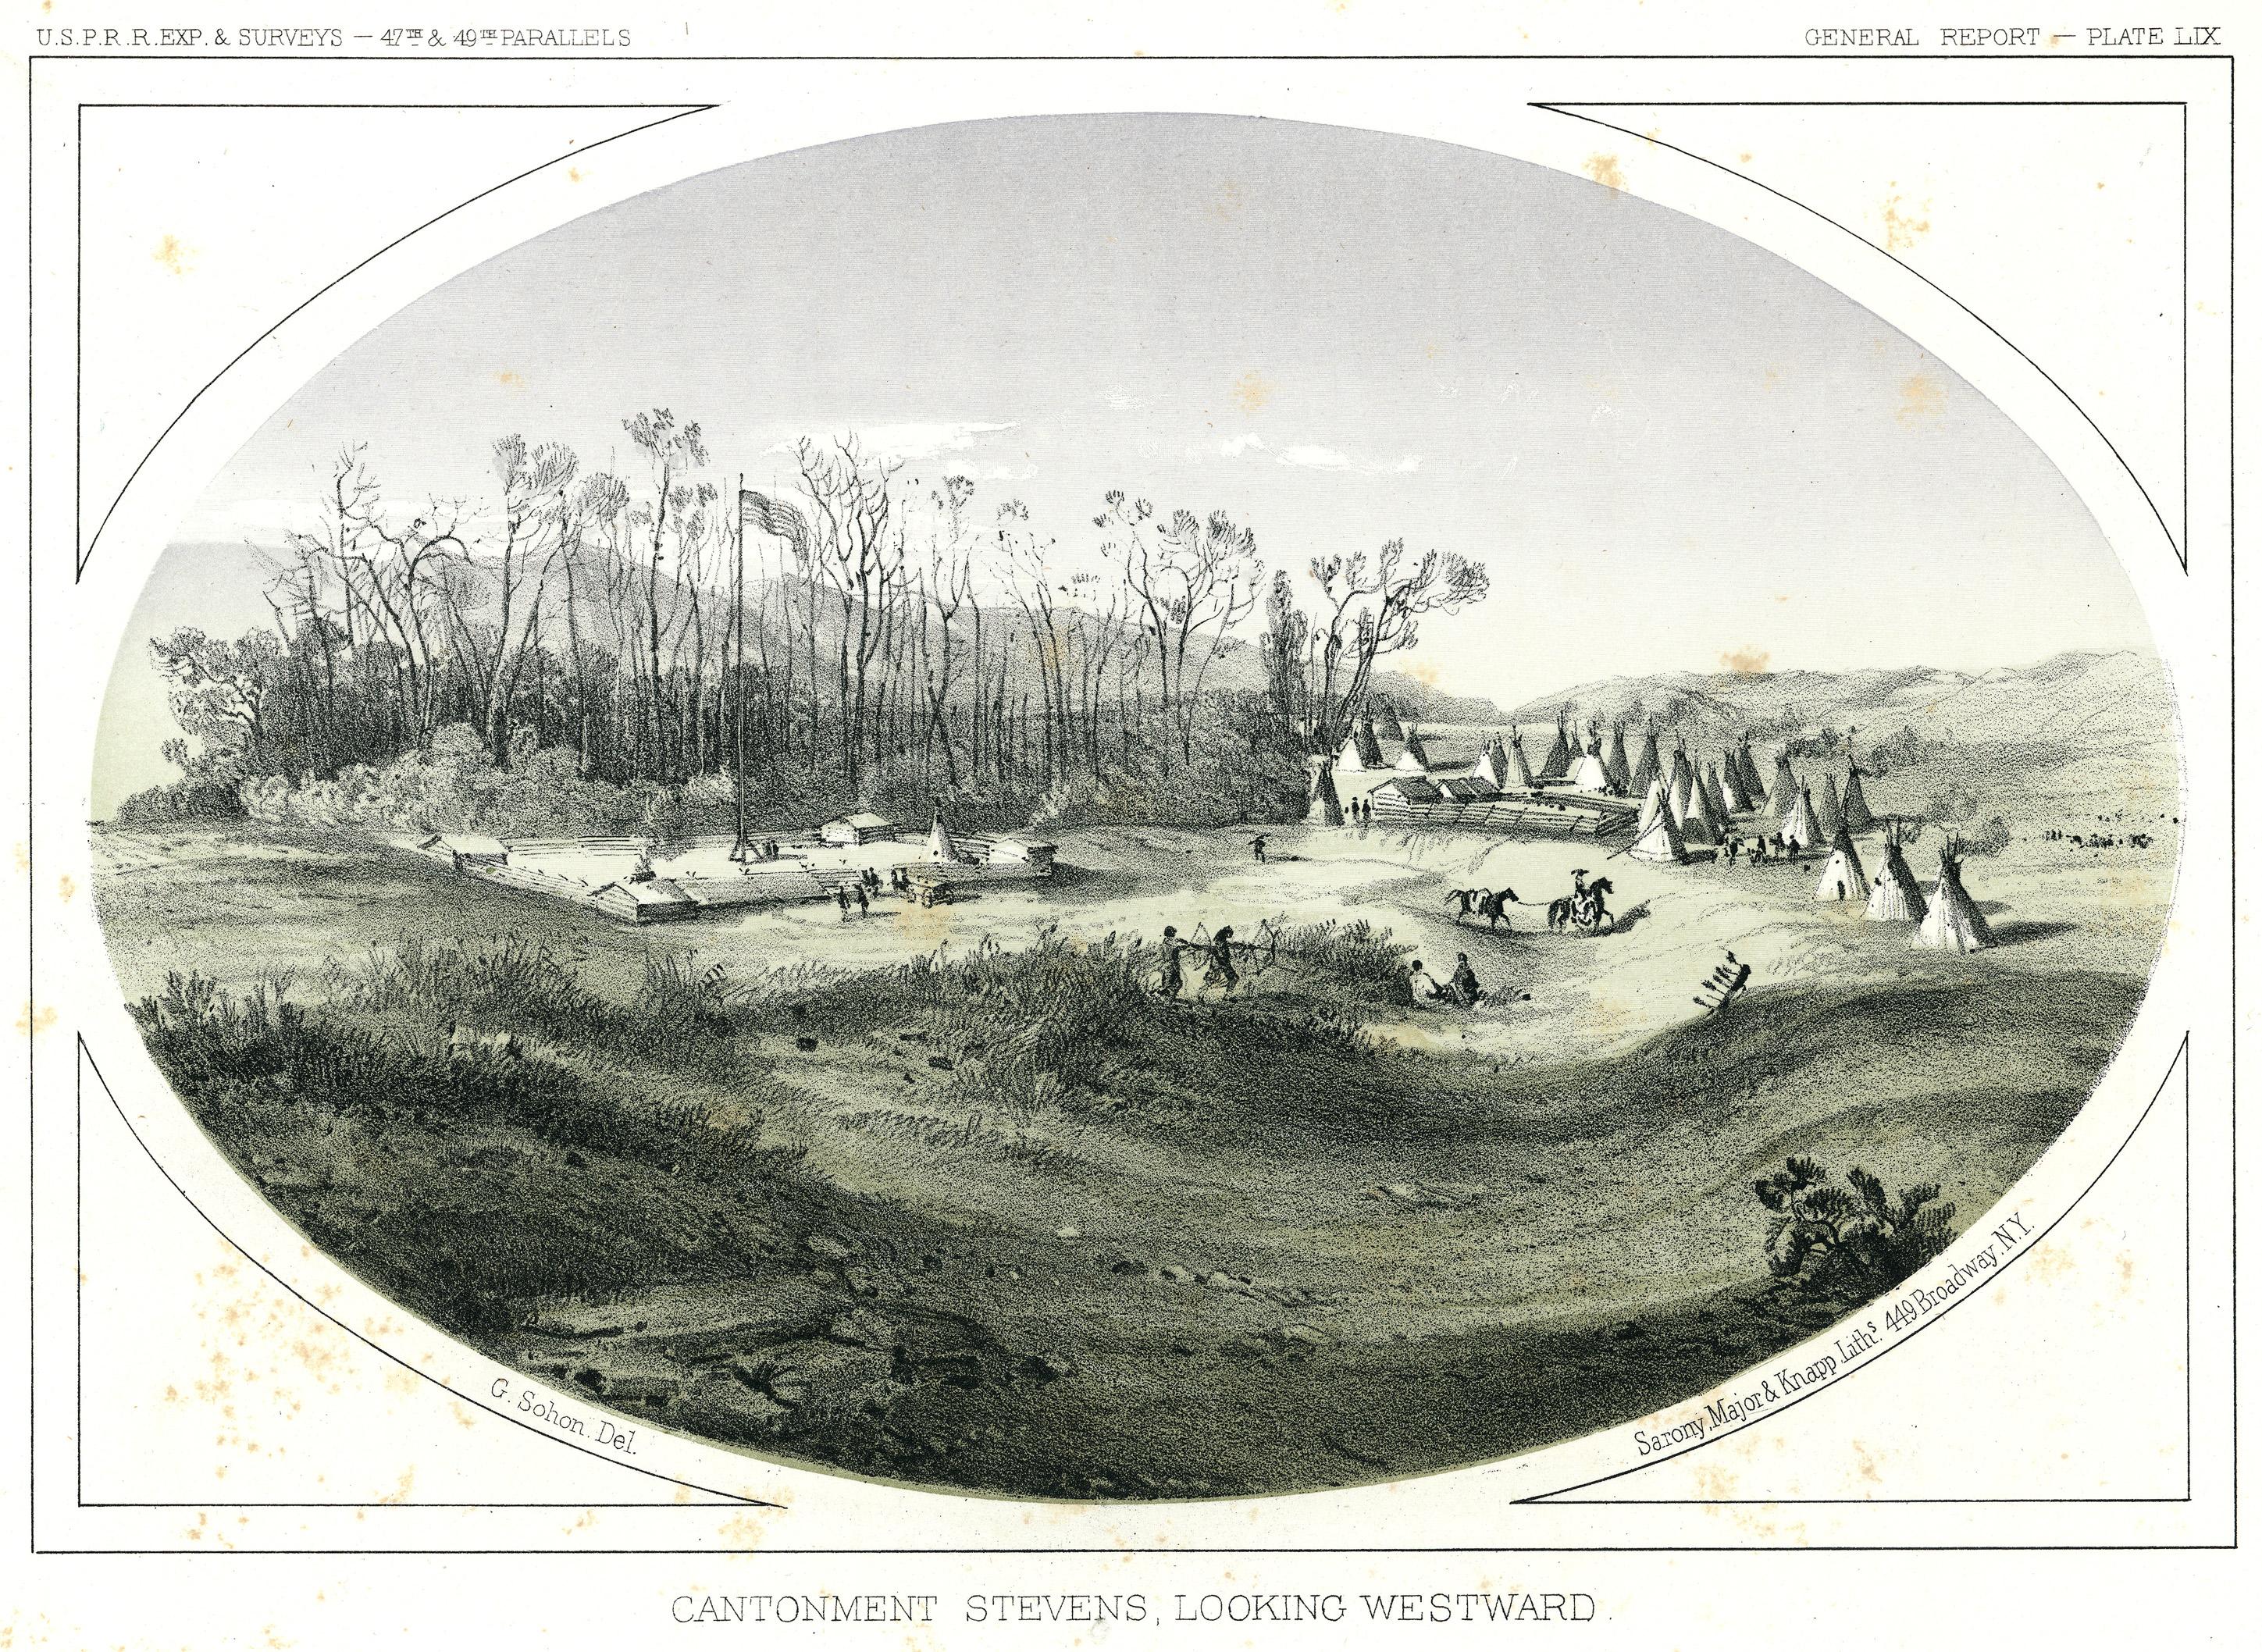 Cantonment Stevens, Looking Westward